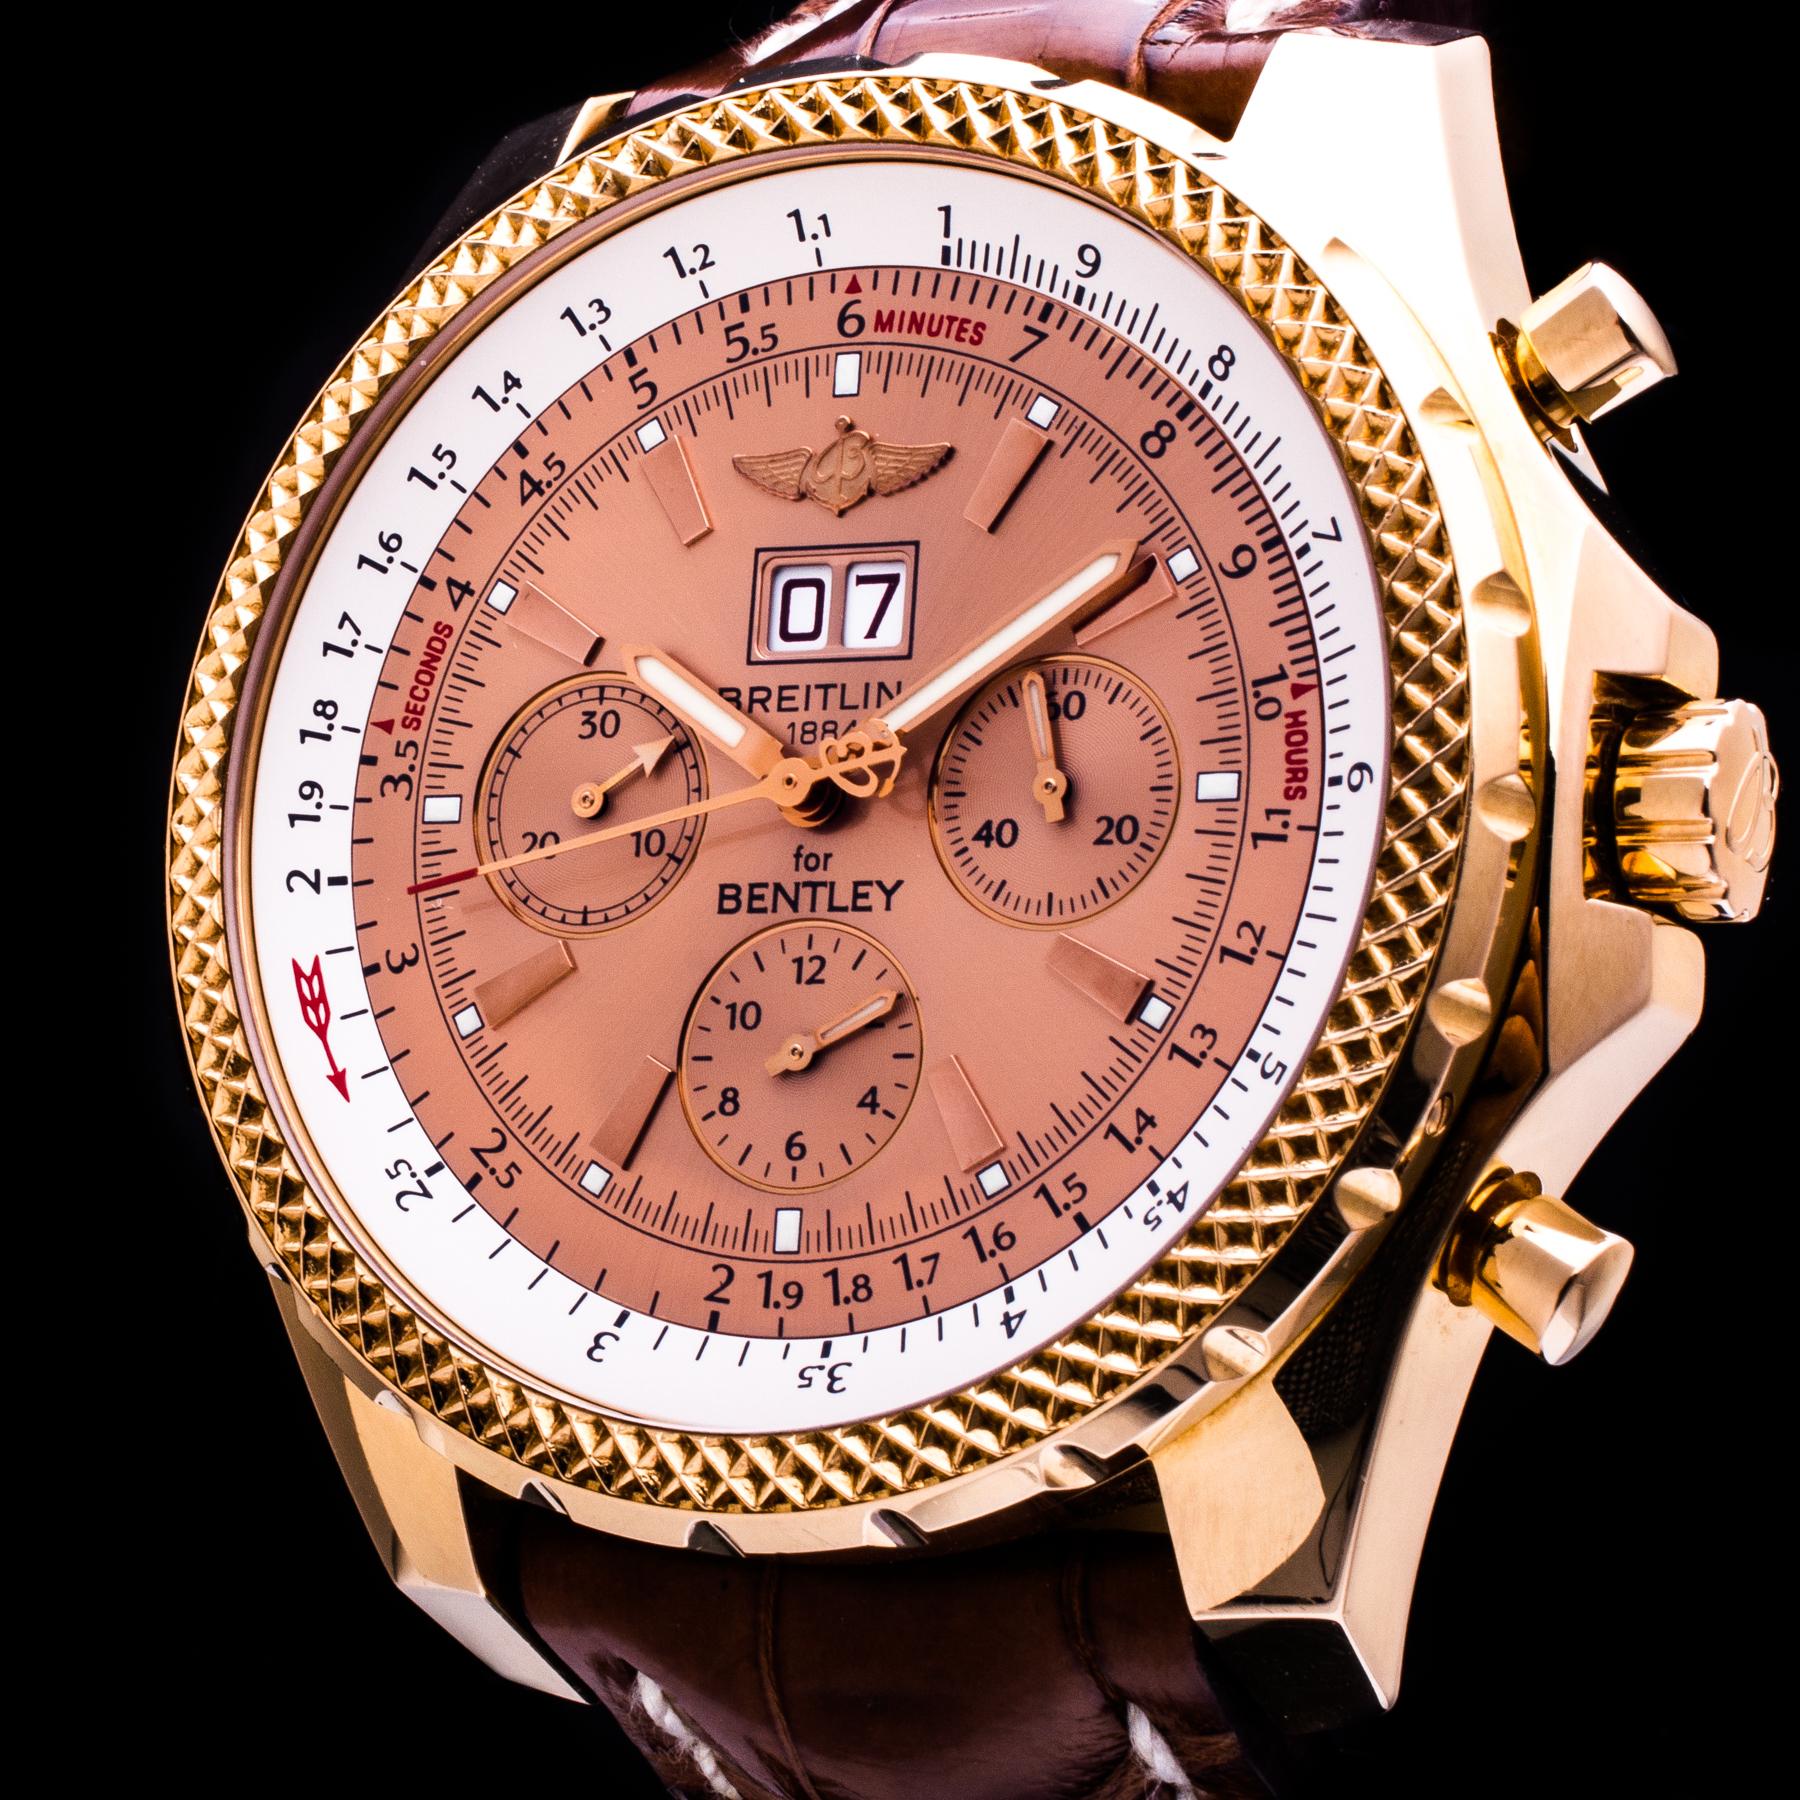 Bentley 6.75 18K Rosegold Chronograph Automatik 100 Pieces Limited